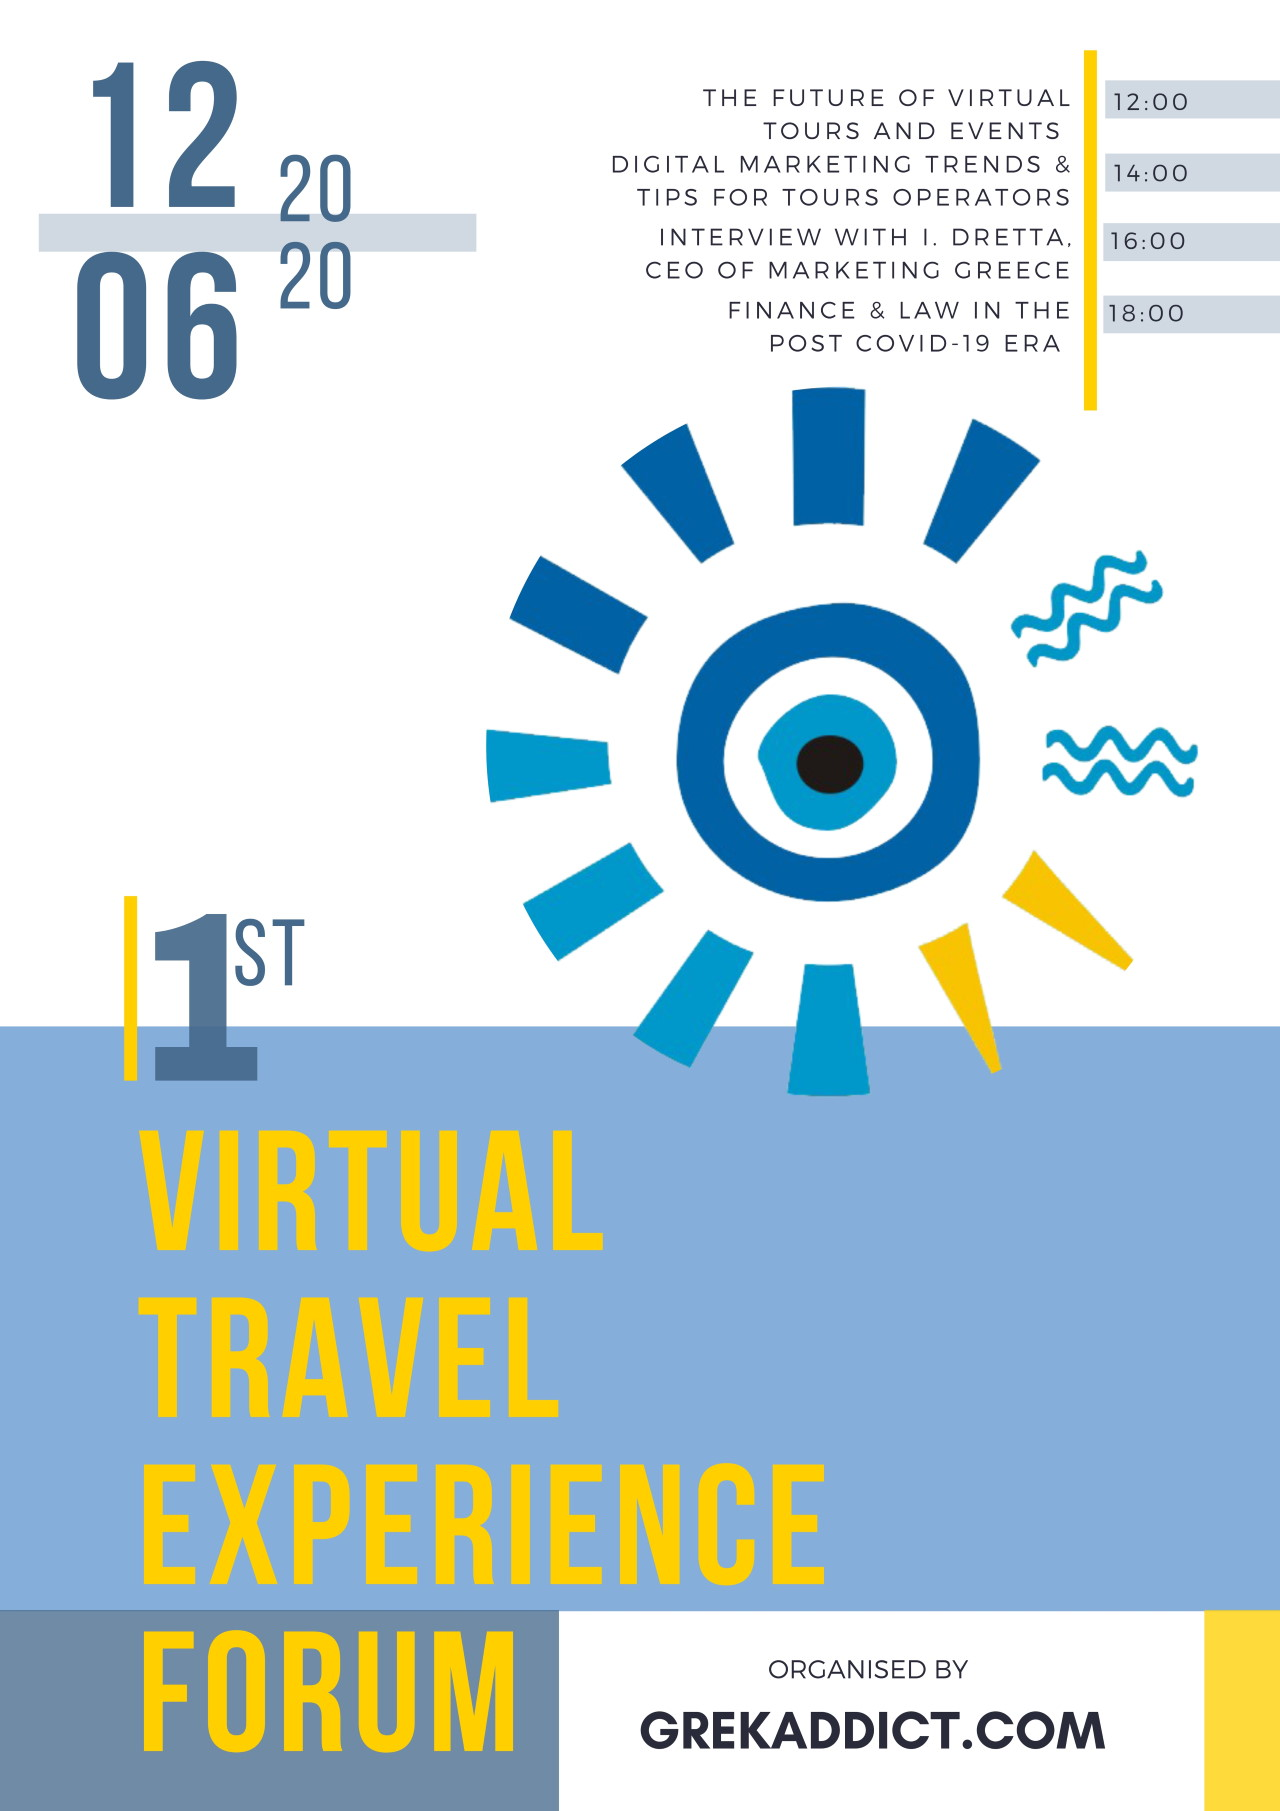 1st Virtual Travel Experience Forum